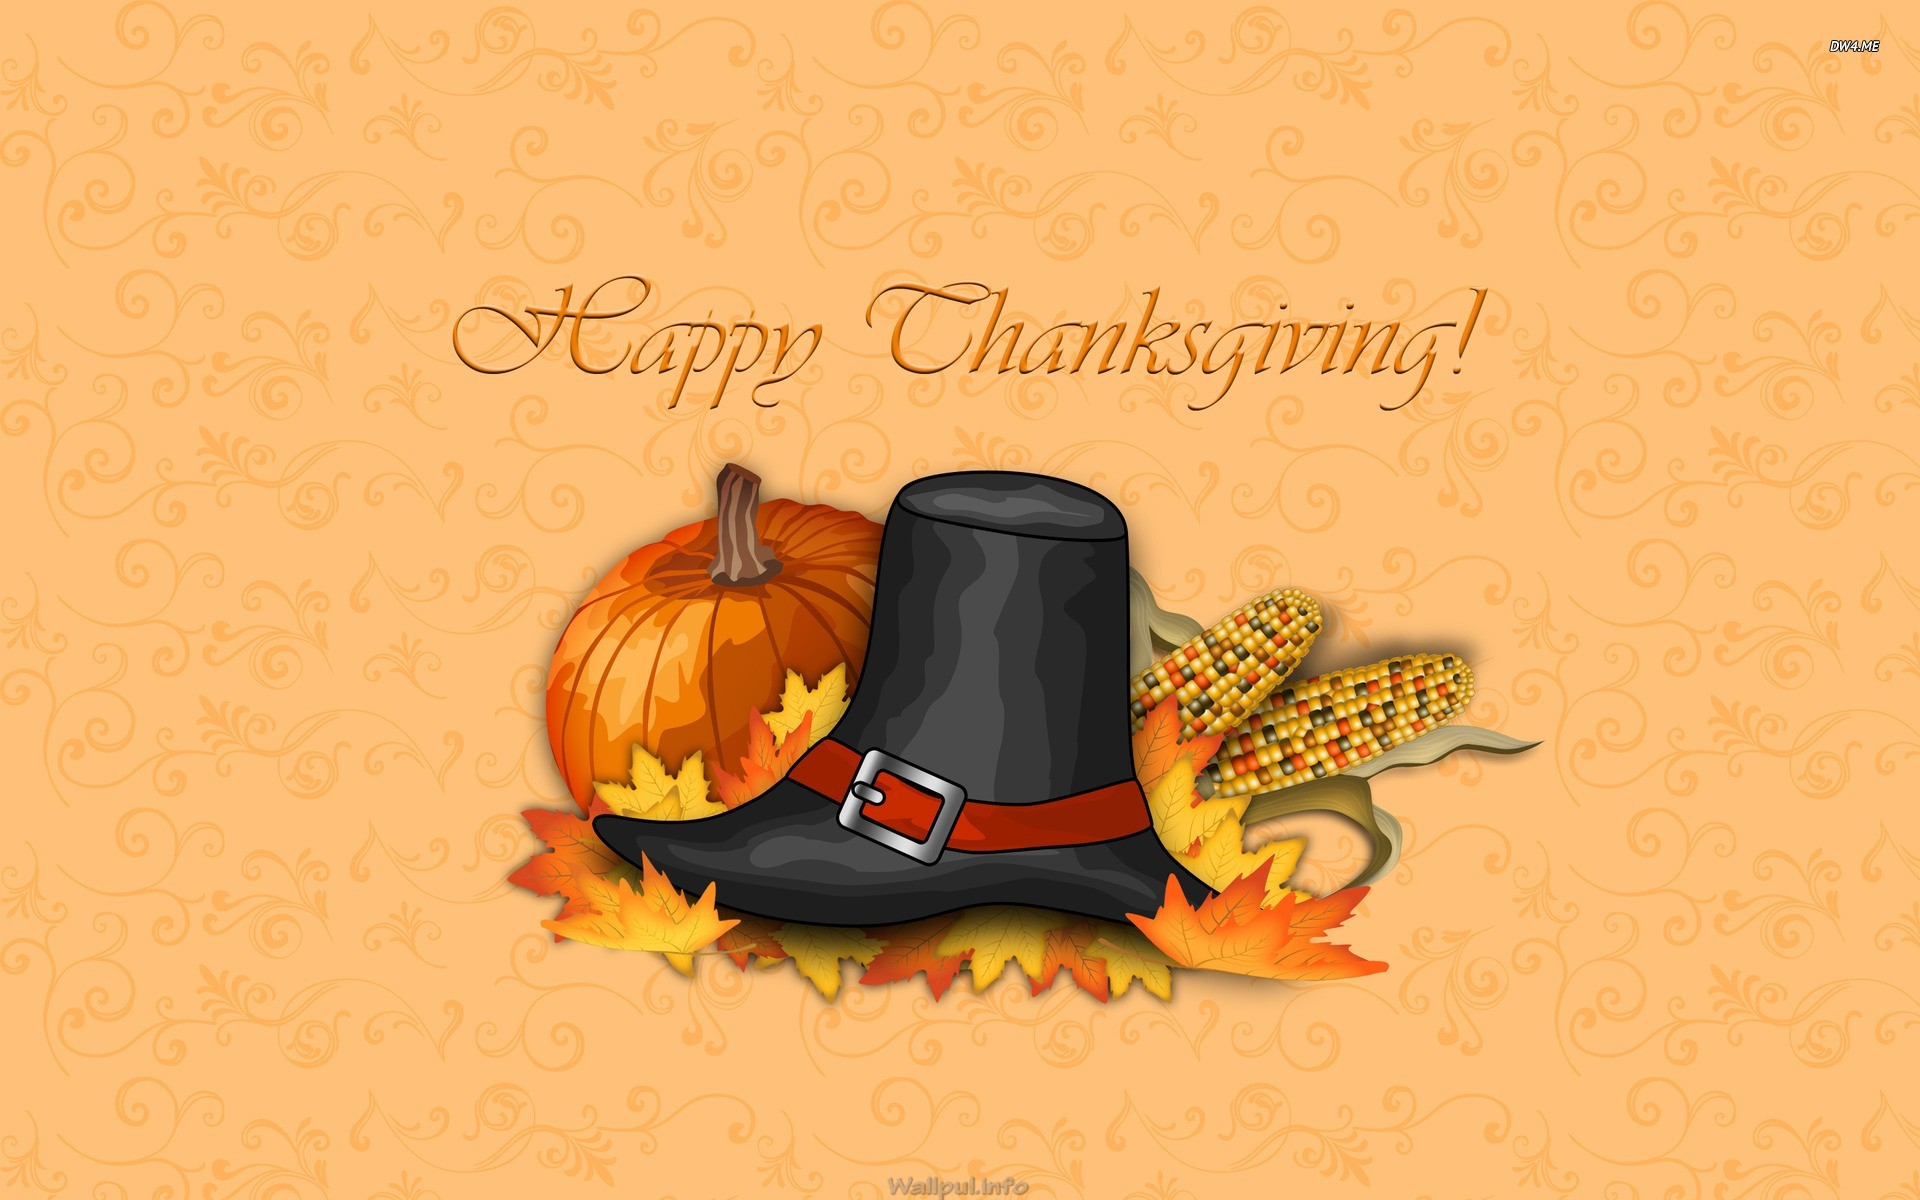 Celebration Thanksgiving Wallpaper Computer Hd …